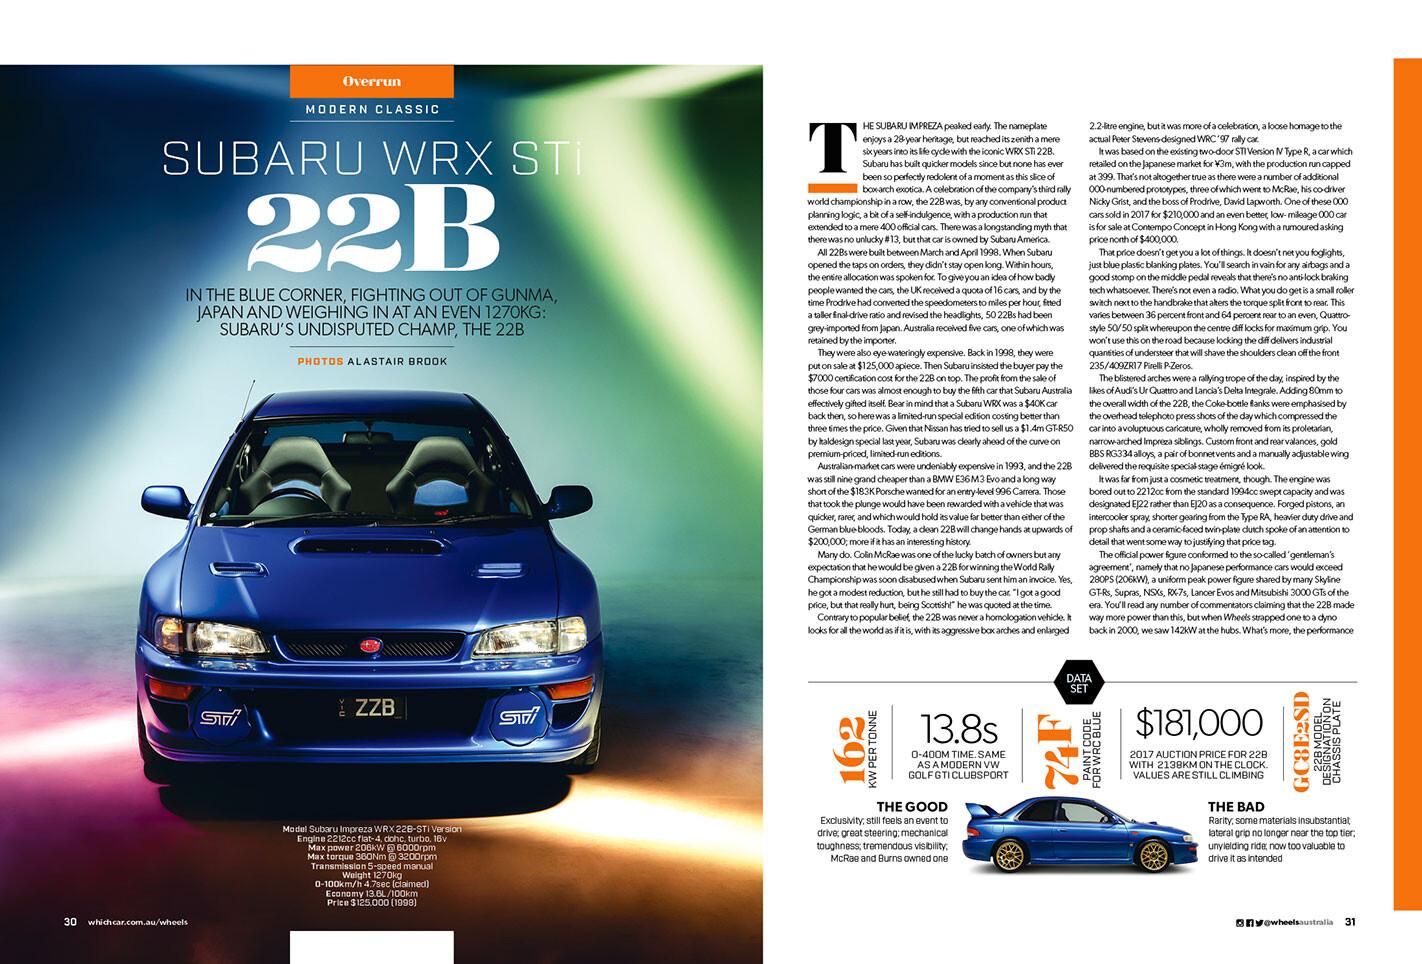 Subaru WRX STi 22B Modern Classic Mag Preview